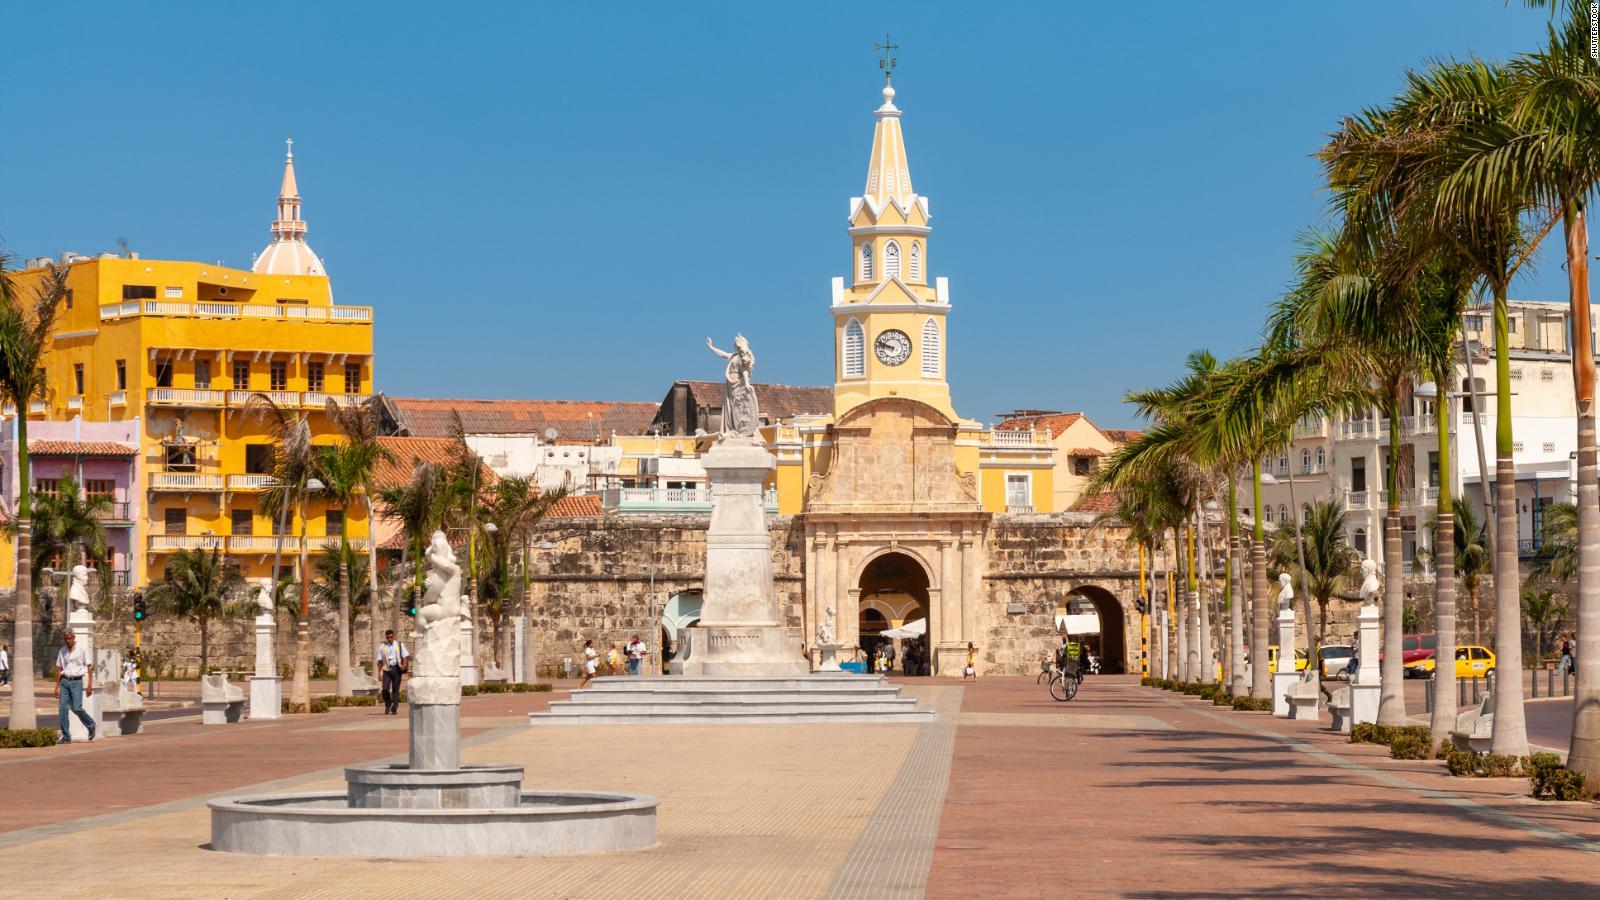 Sejarah Singkat Cartagena